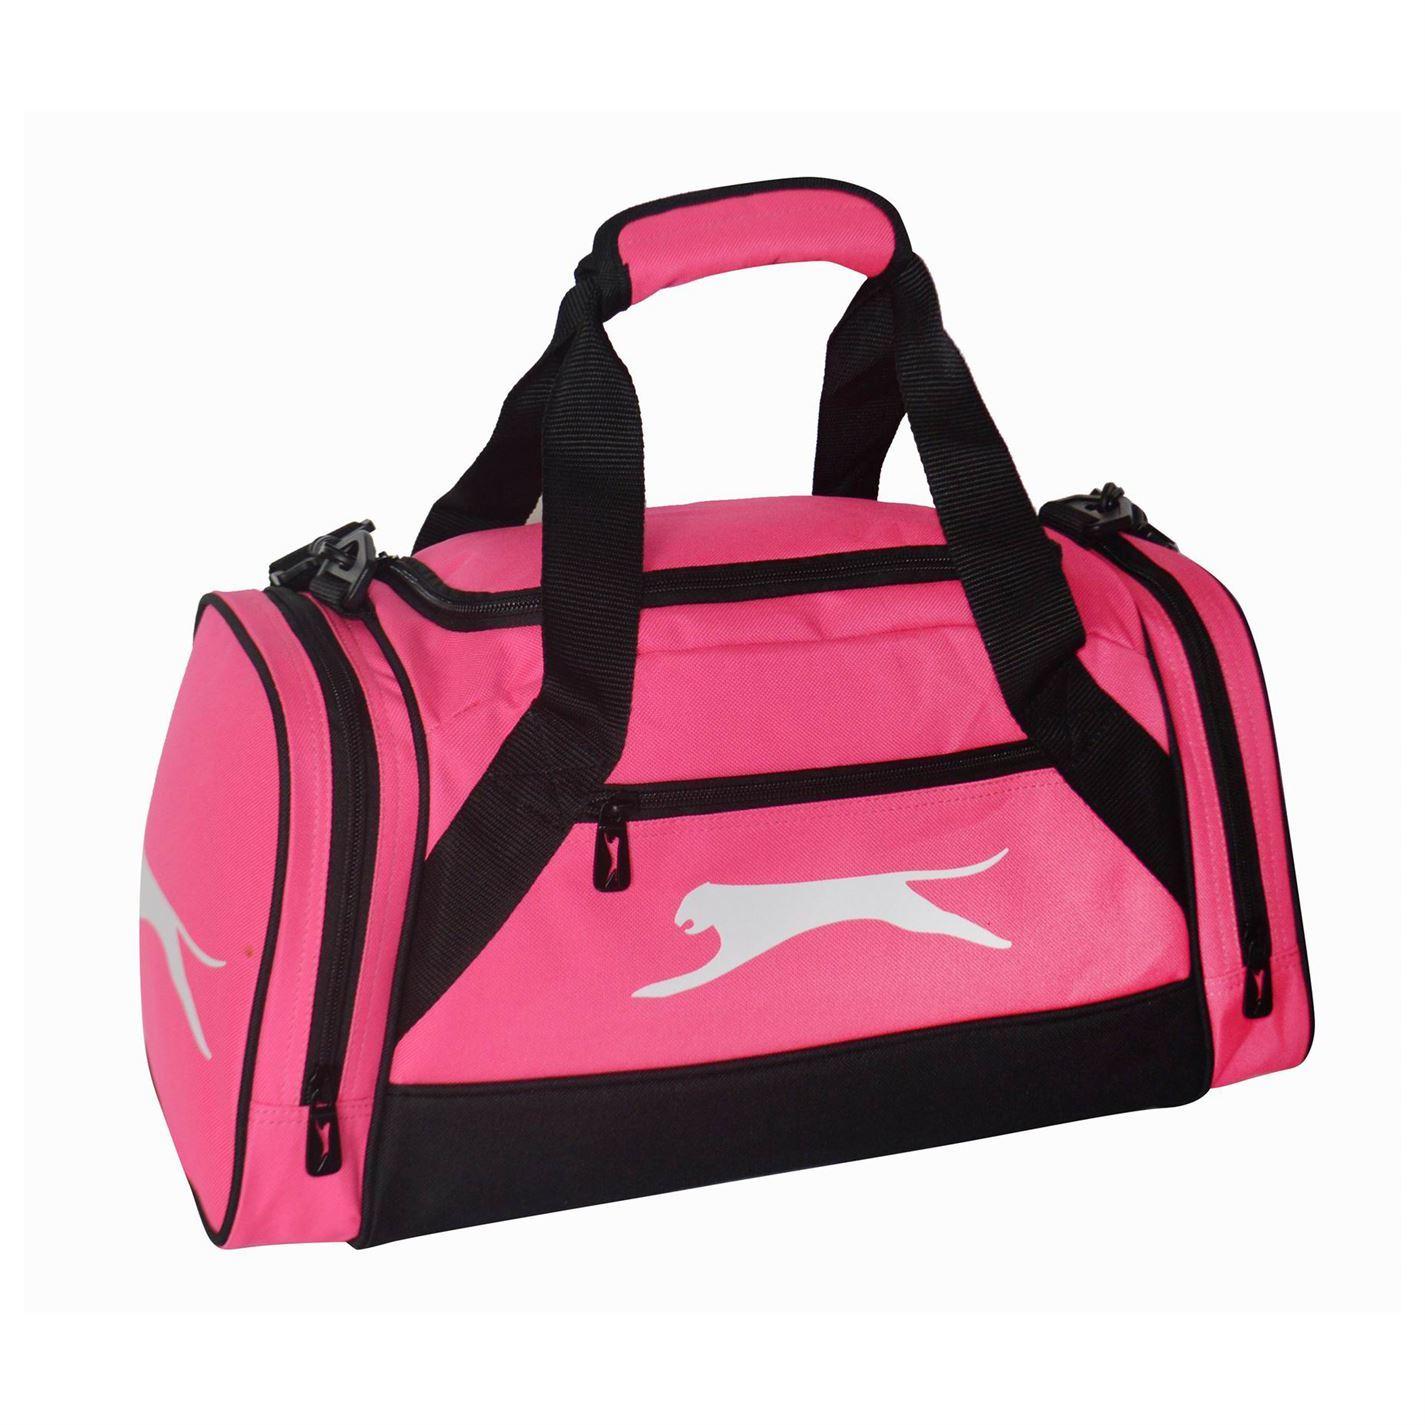 Slazenger Extra Small Holdall Fuchsia Sports Bag Gymbag Carryall